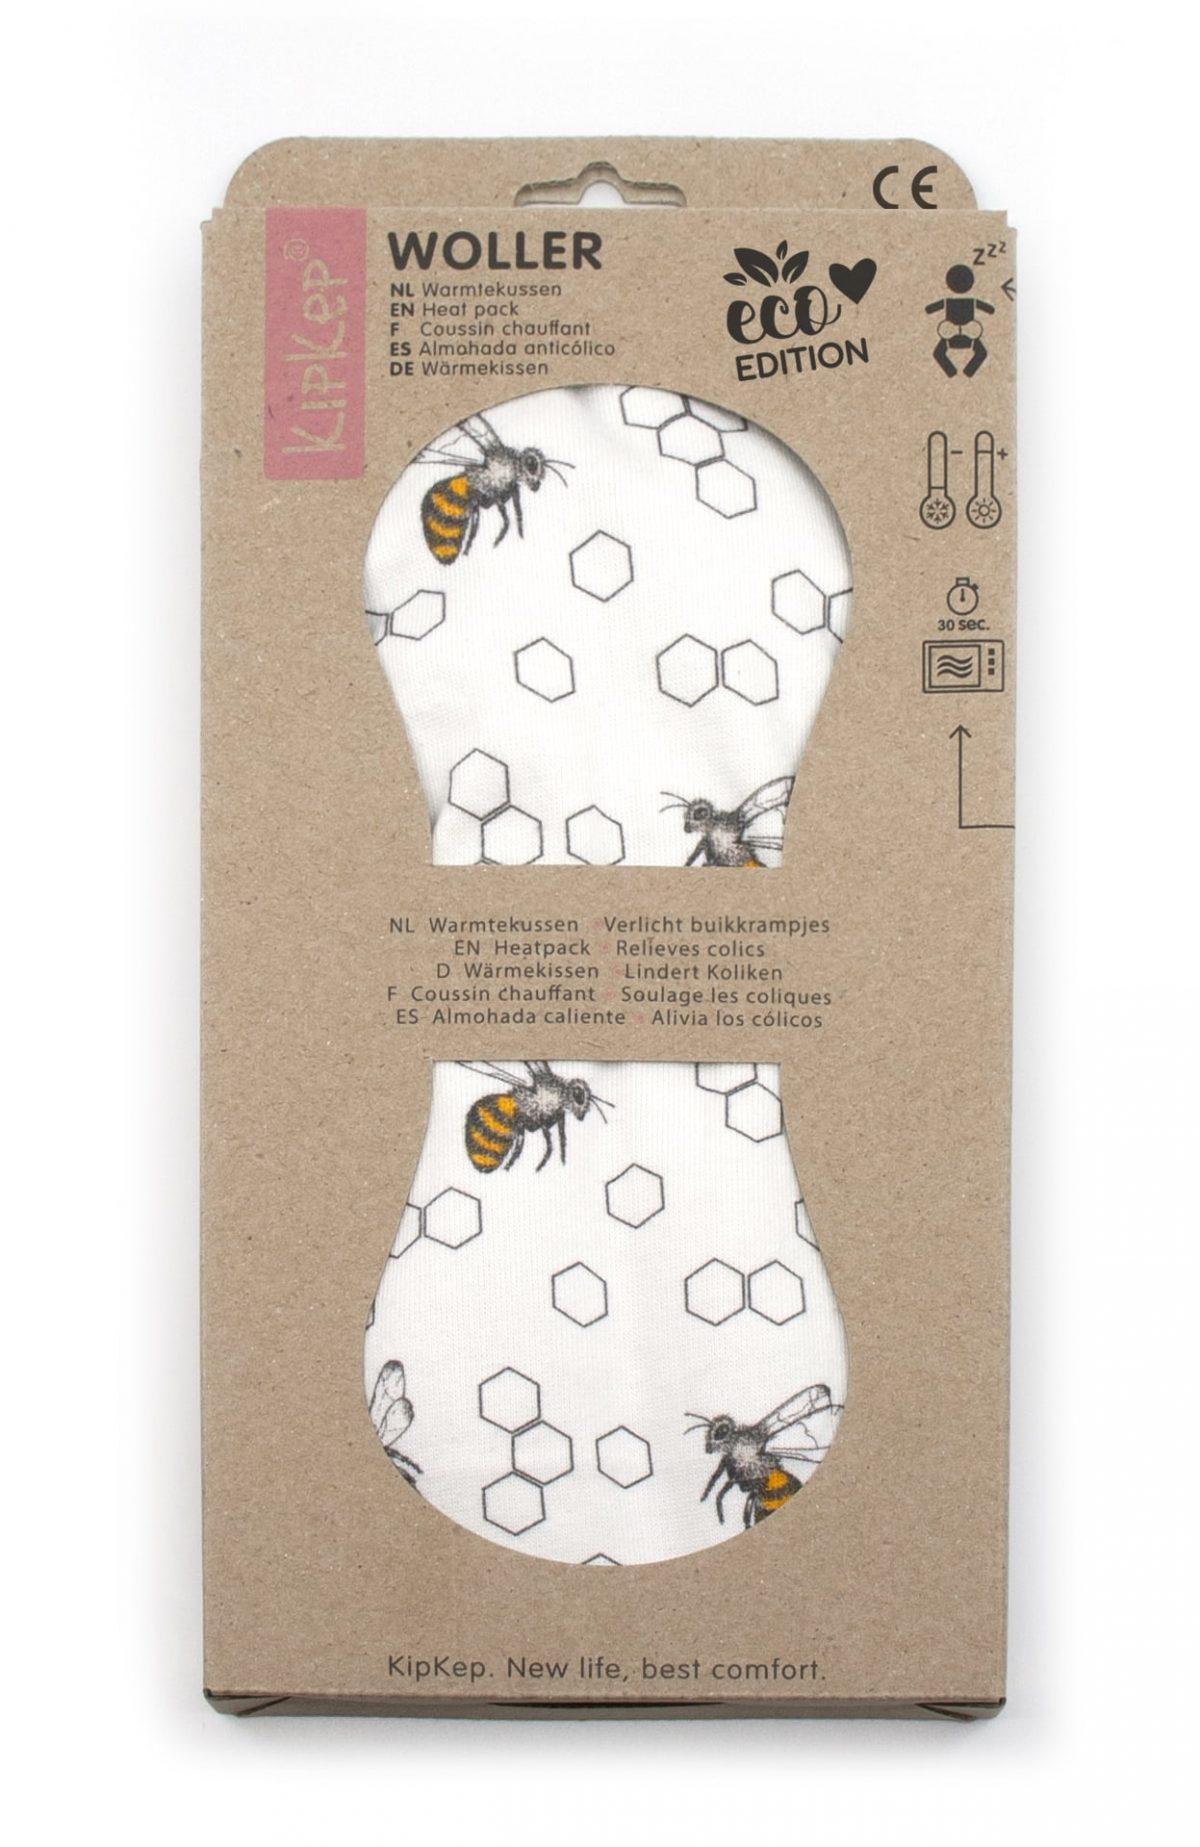 ECO grelec za krče KipKep Wooler - Bee special edition-1277